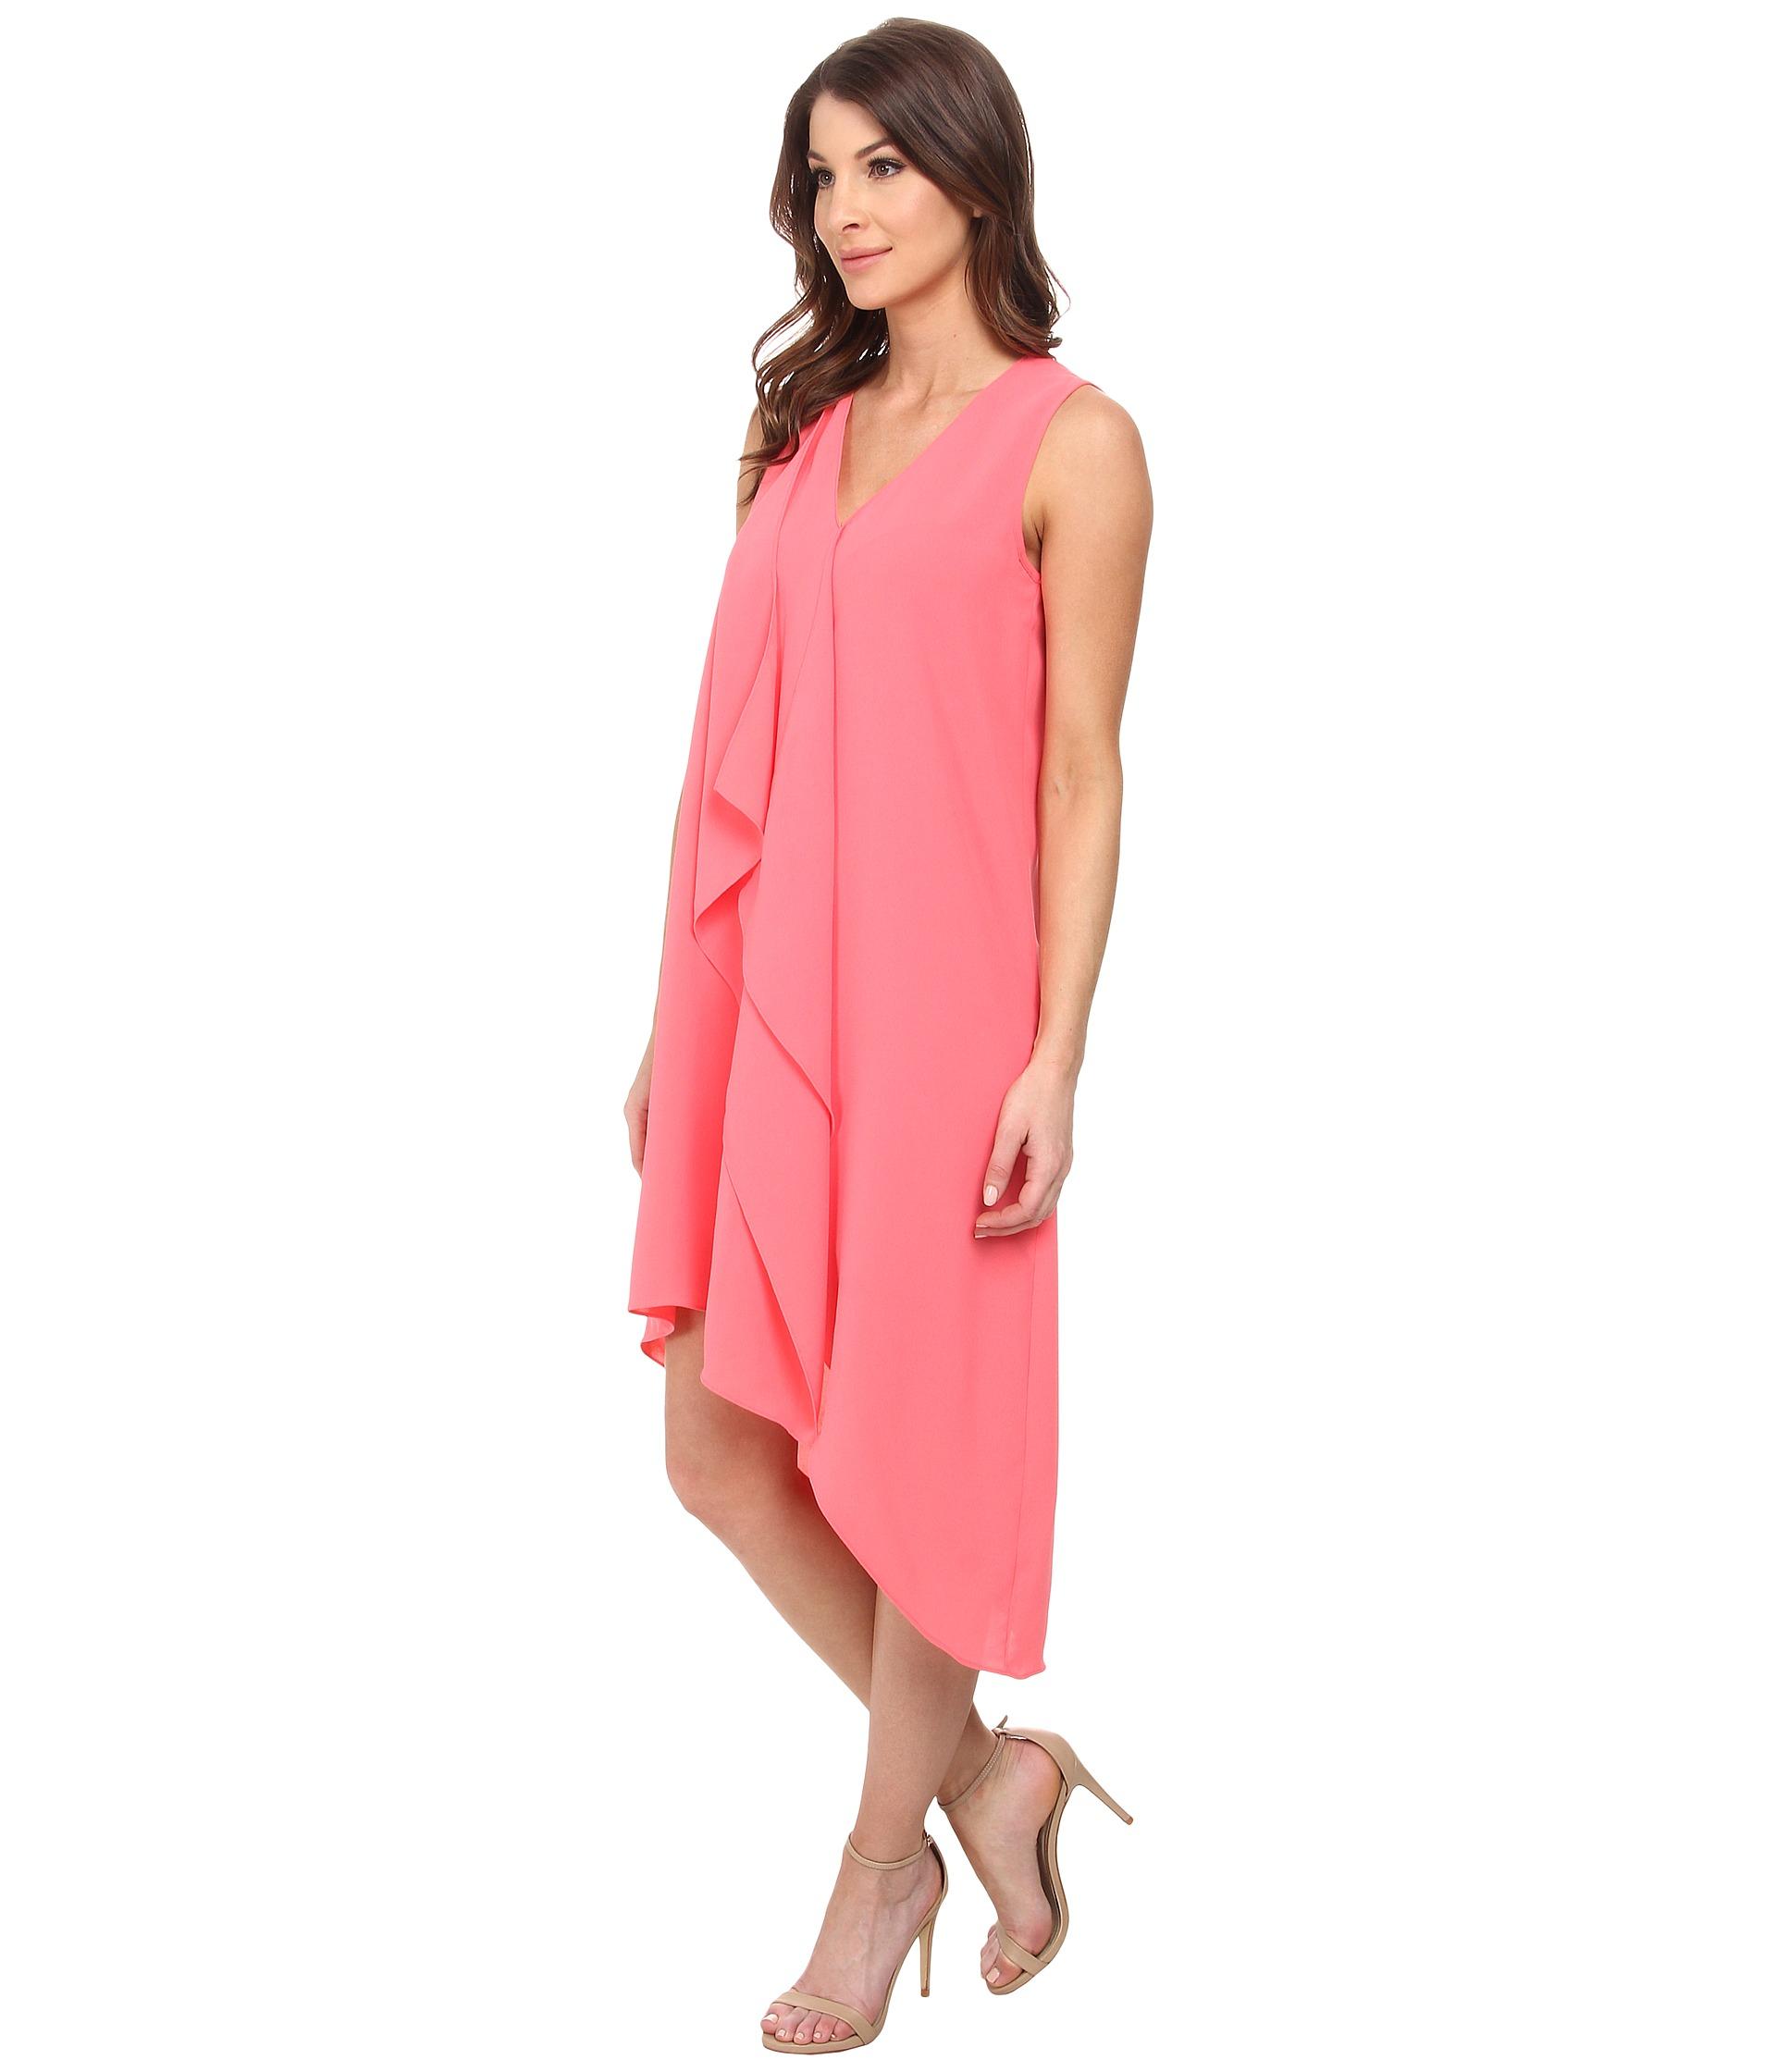 Asymmetric Drape Dress: Adrianna Papell Asymmetrical Front Drape Dress In Pink